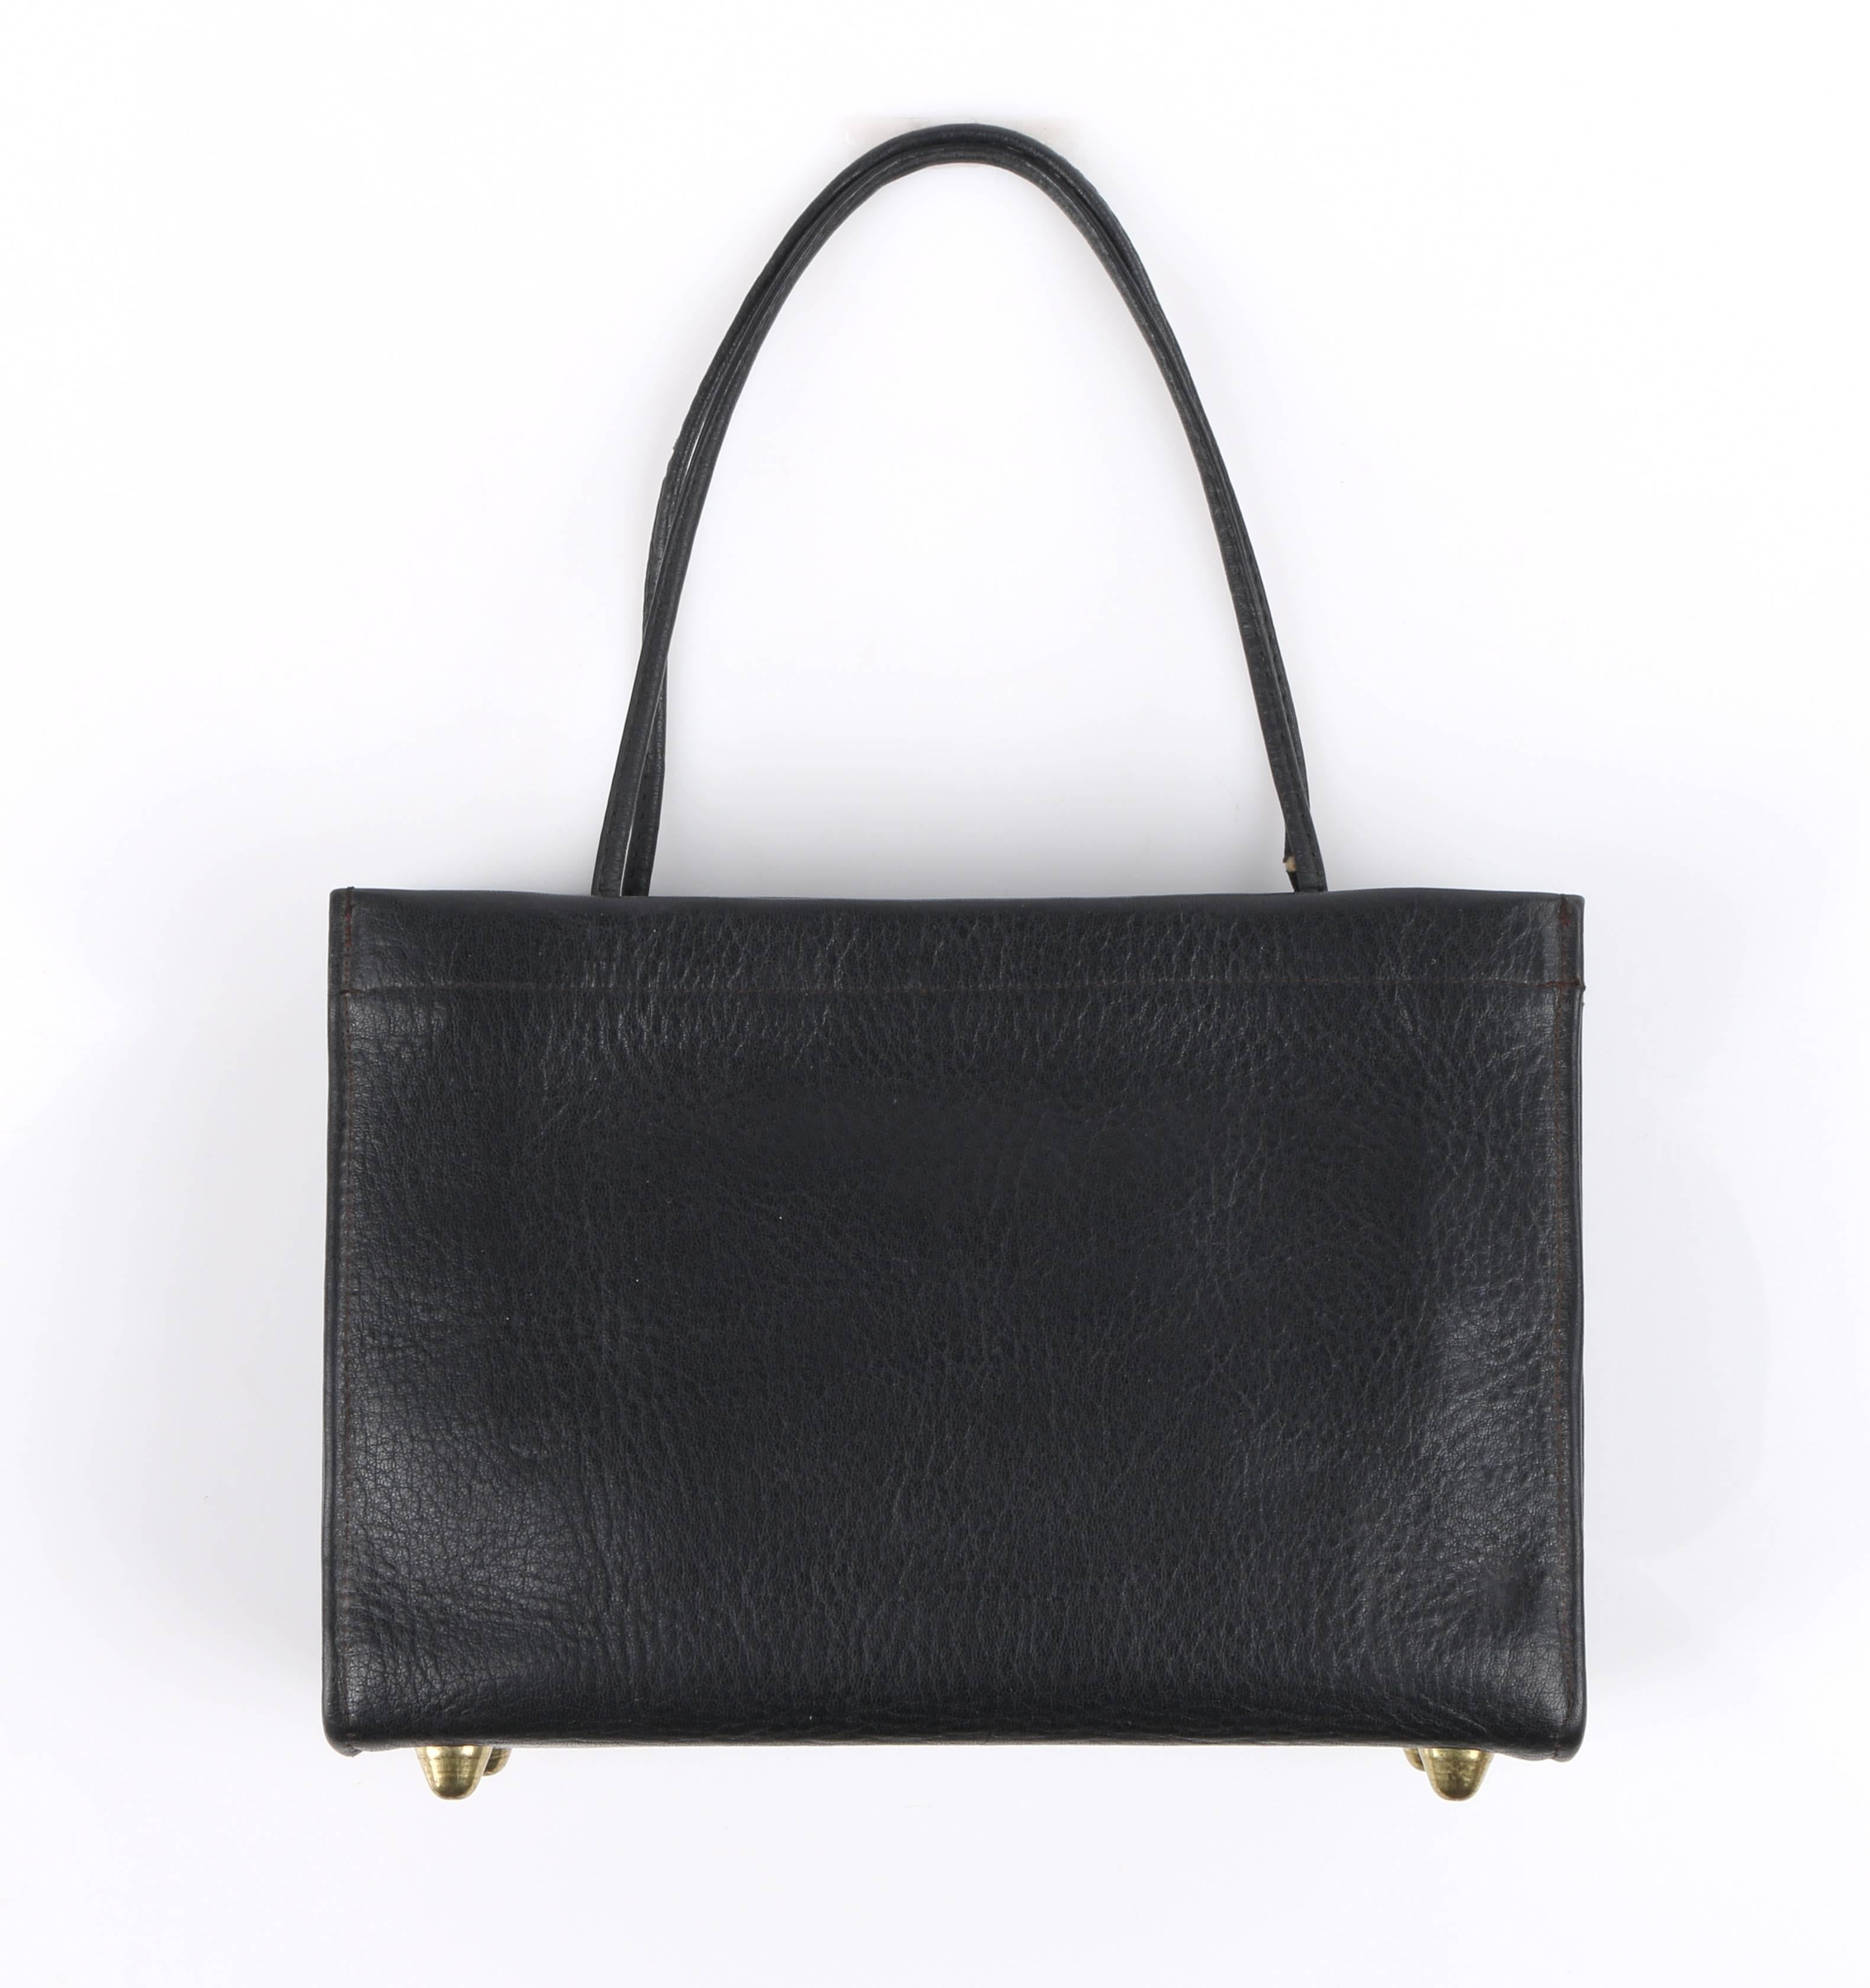 877423481f97 COACH c.1967 BONNIE CASHIN Black Pebbled Leather Kiss Lock Mini Tote Bag  Purse For Sale at 1stdibs